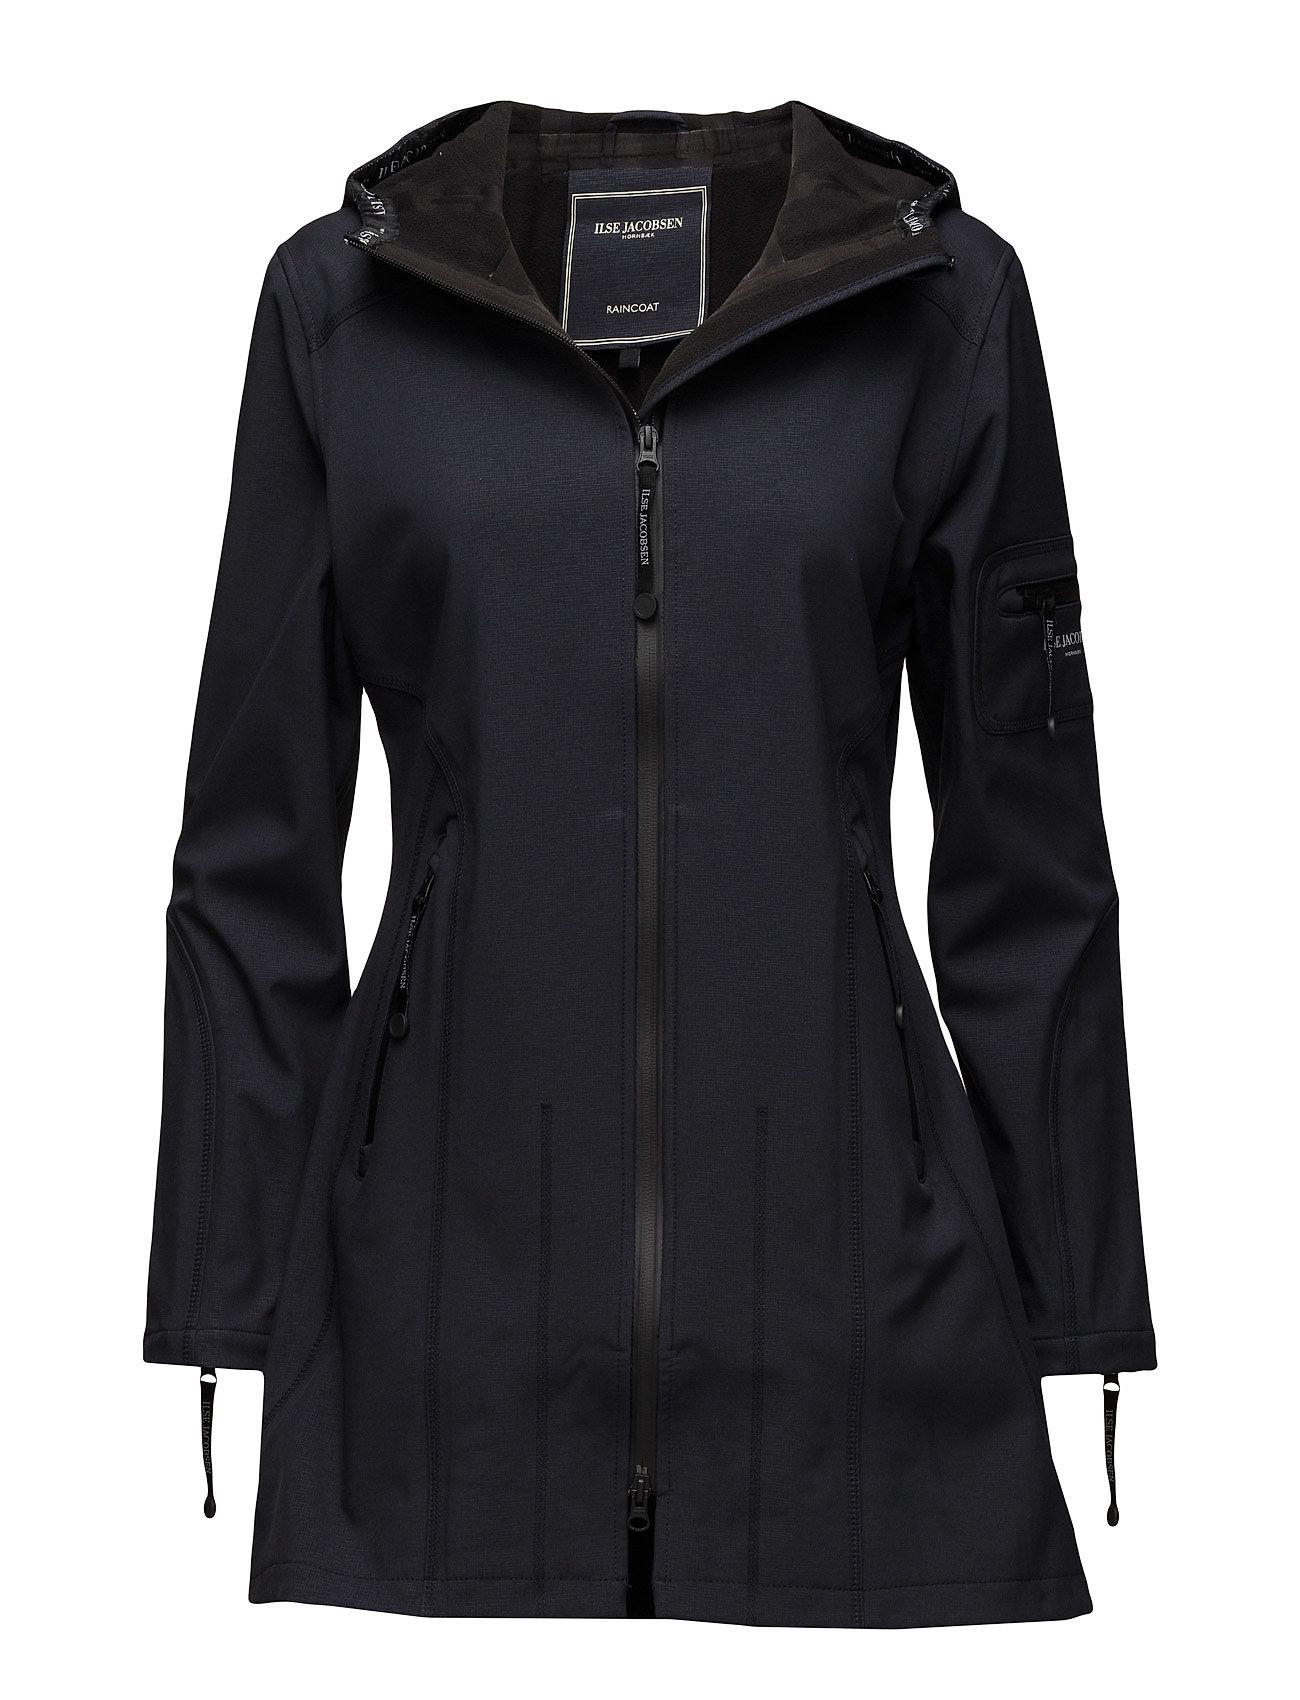 Image of Hip-Length Softshell Raincoat Regntøj Blå Ilse Jacobsen (2387044993)